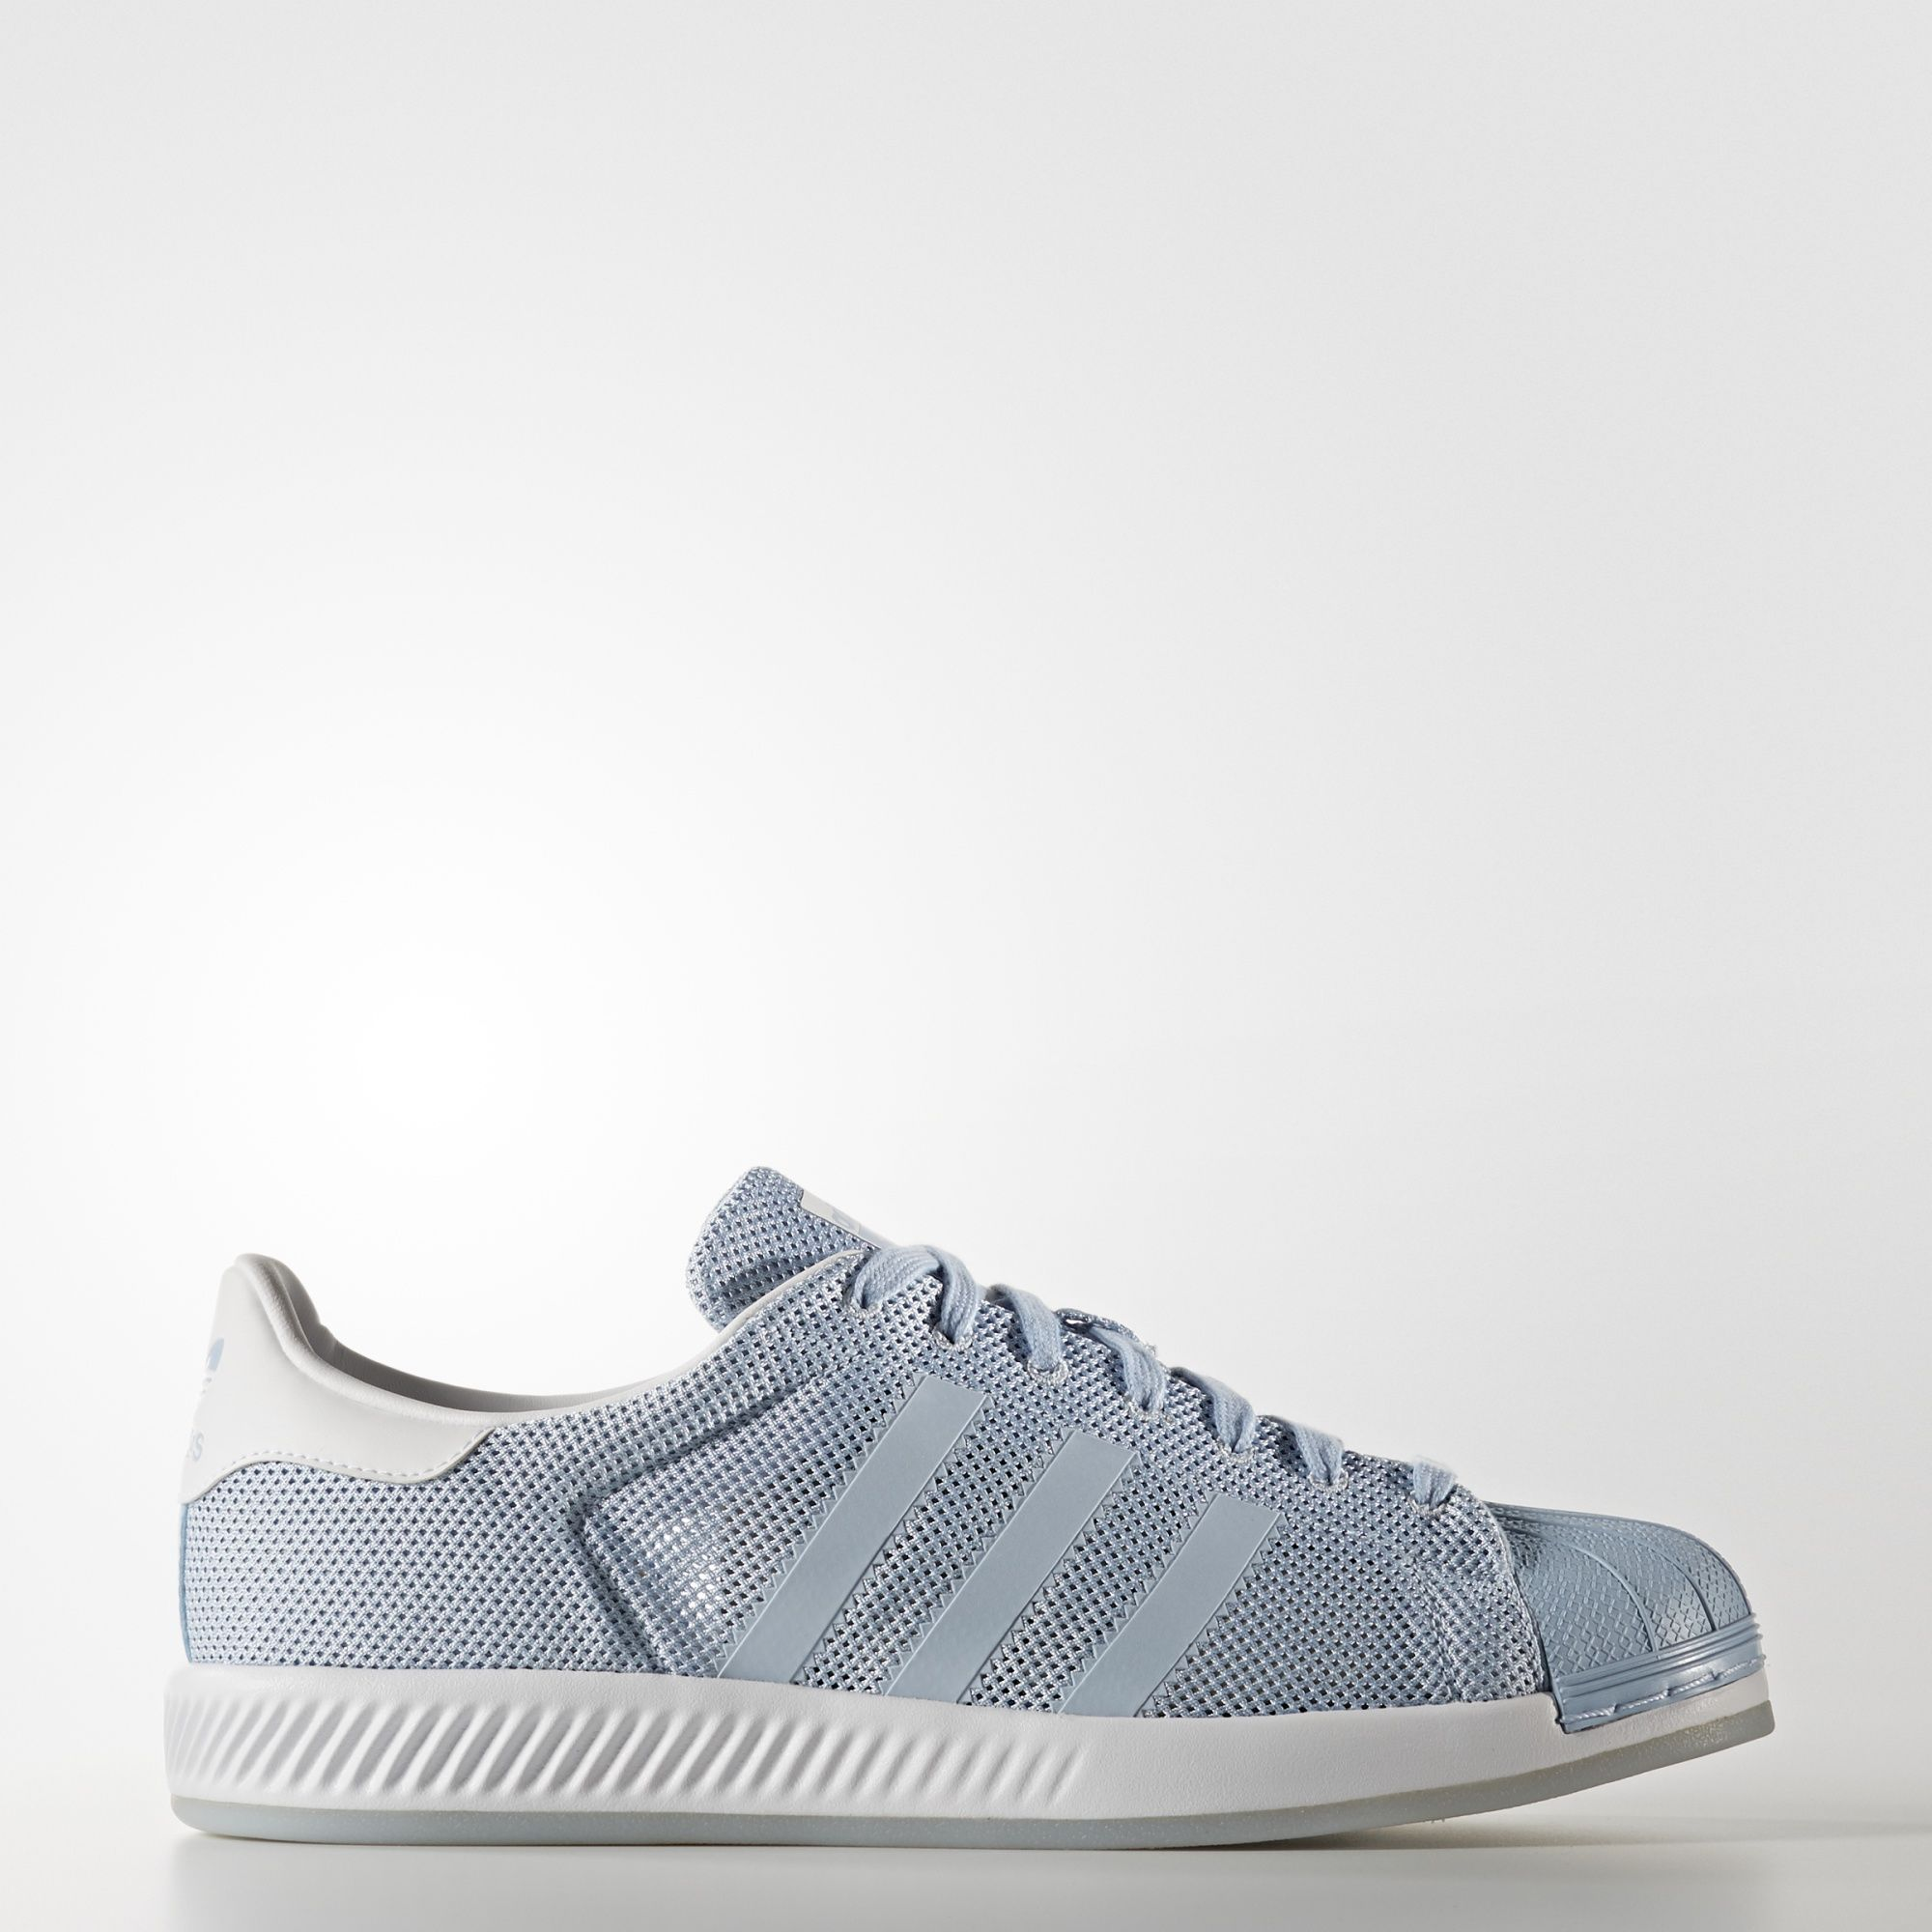 adidas shoes that light up samosas images 601363